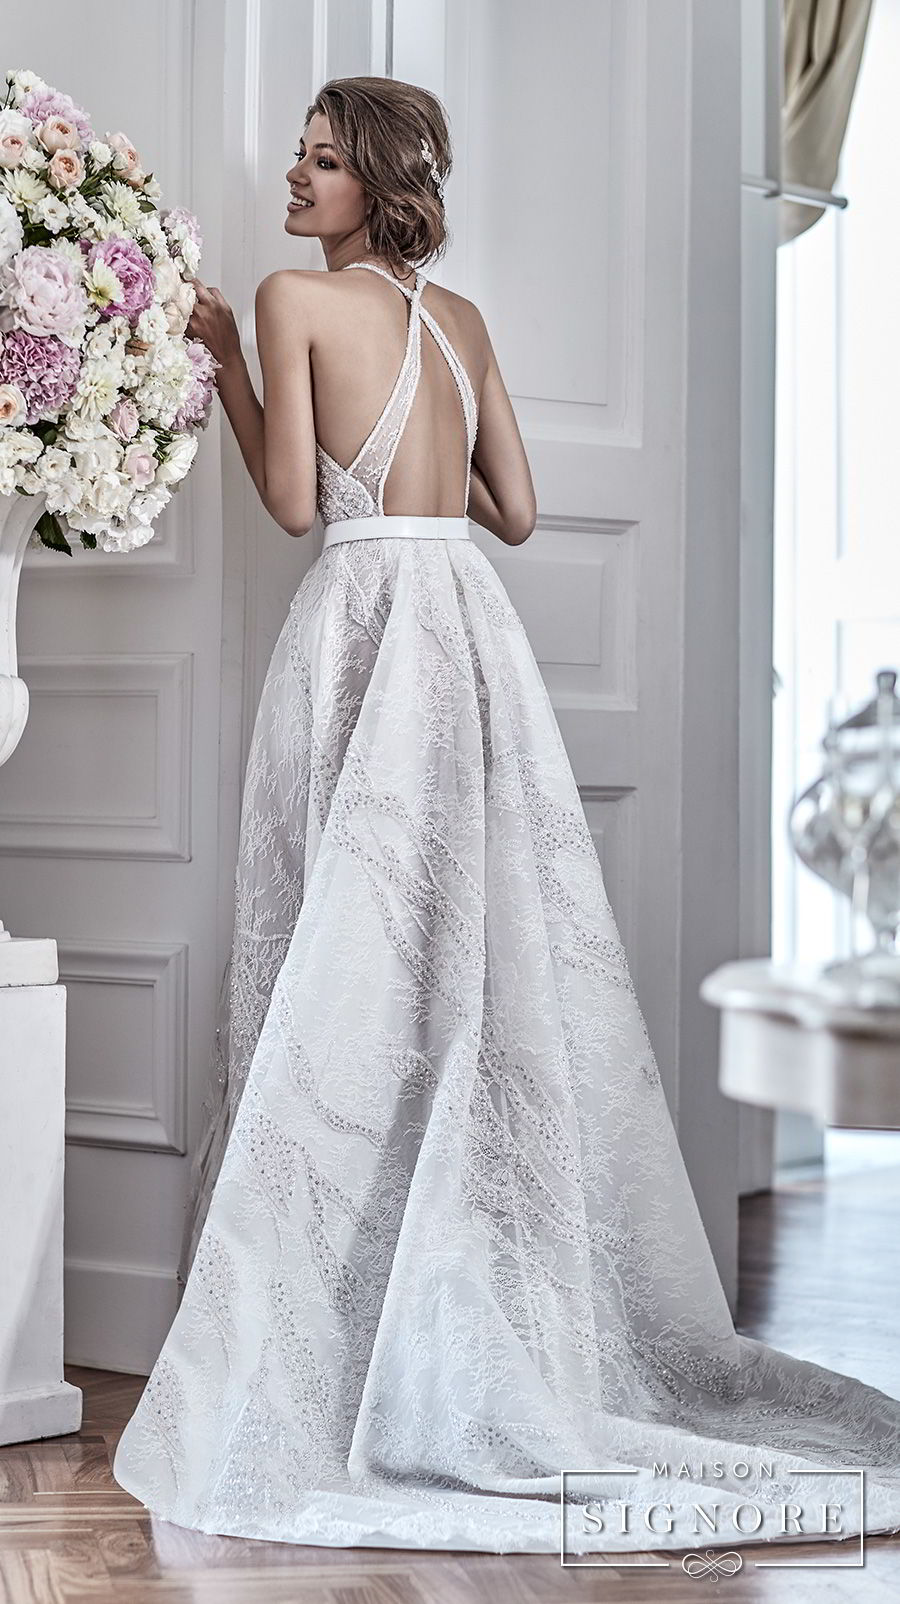 maison signore 2017 bridal sleeveless halter jewel neck full embellishment elegant a  line wedding dress with pocket cross strap back chapel train (demy)  bv